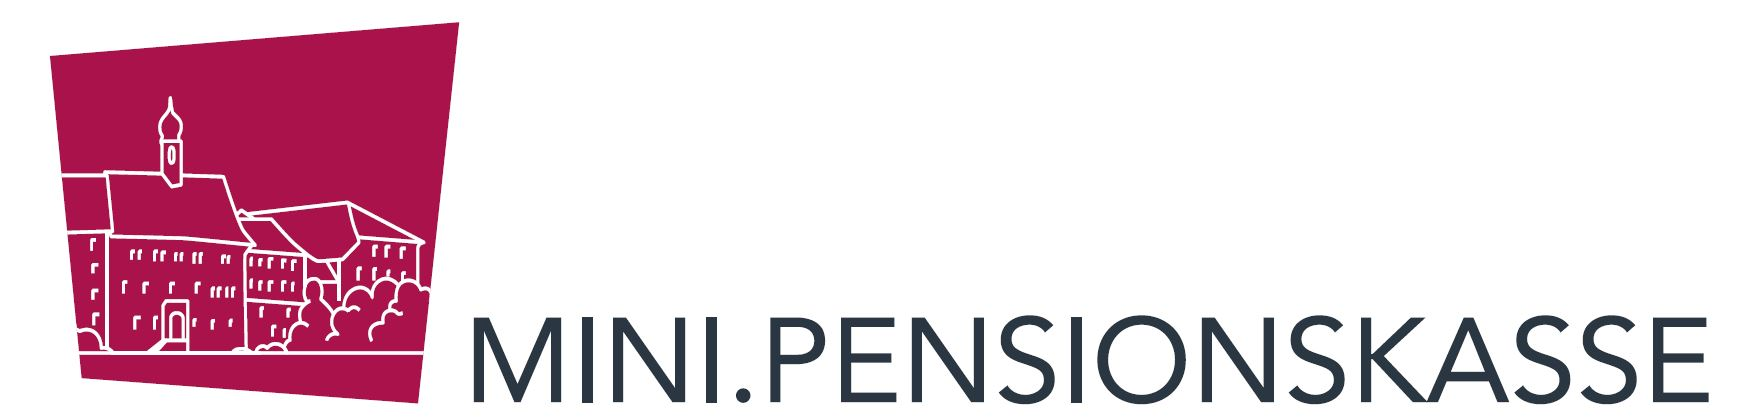 Mini.Pensionskasse